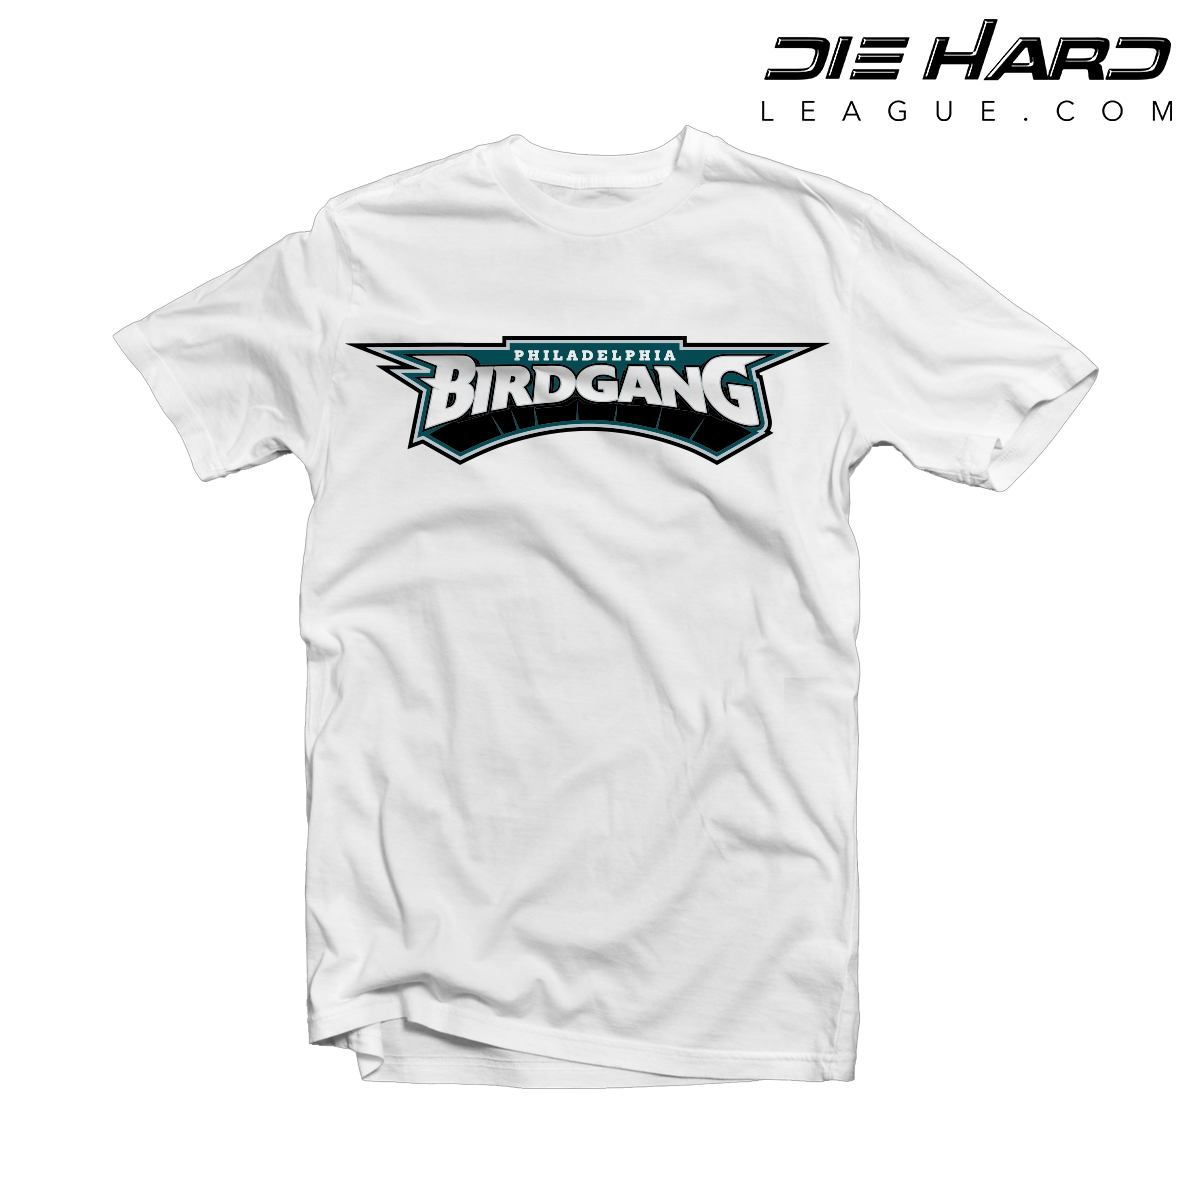 brand new aaefa 9dea6 Eagles T Shirts - Philadelphia Eagles Bird Gang White Tee